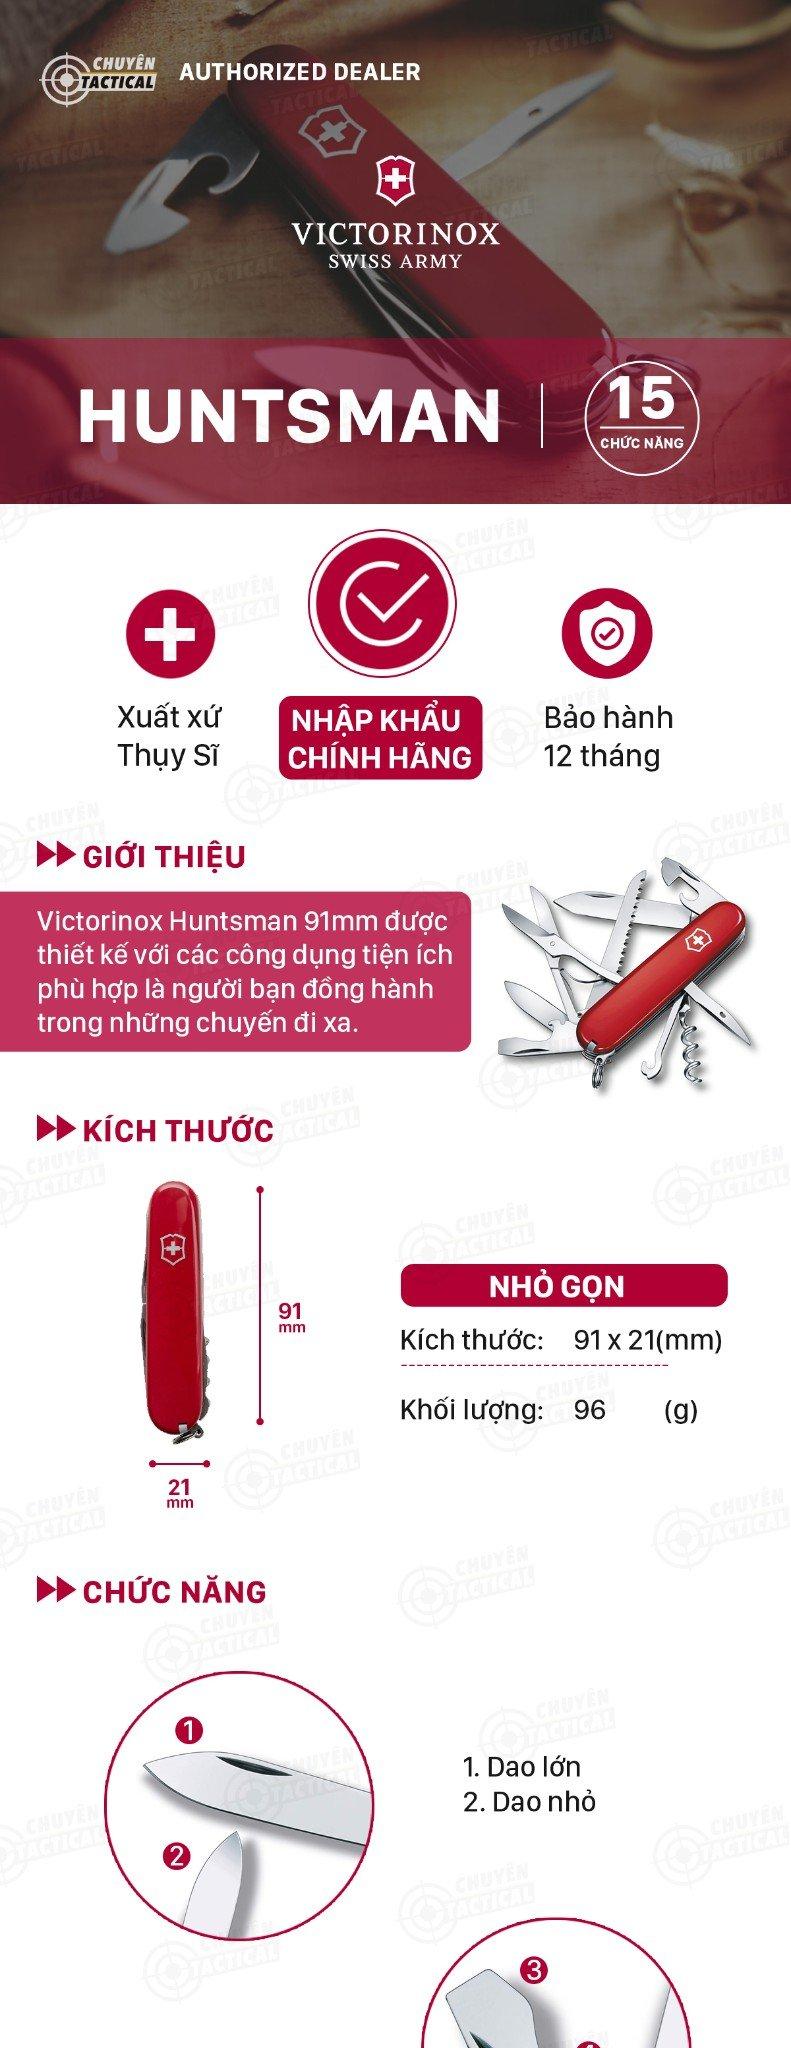 Victorinox Huntsman 91mm (Red) #1.3713